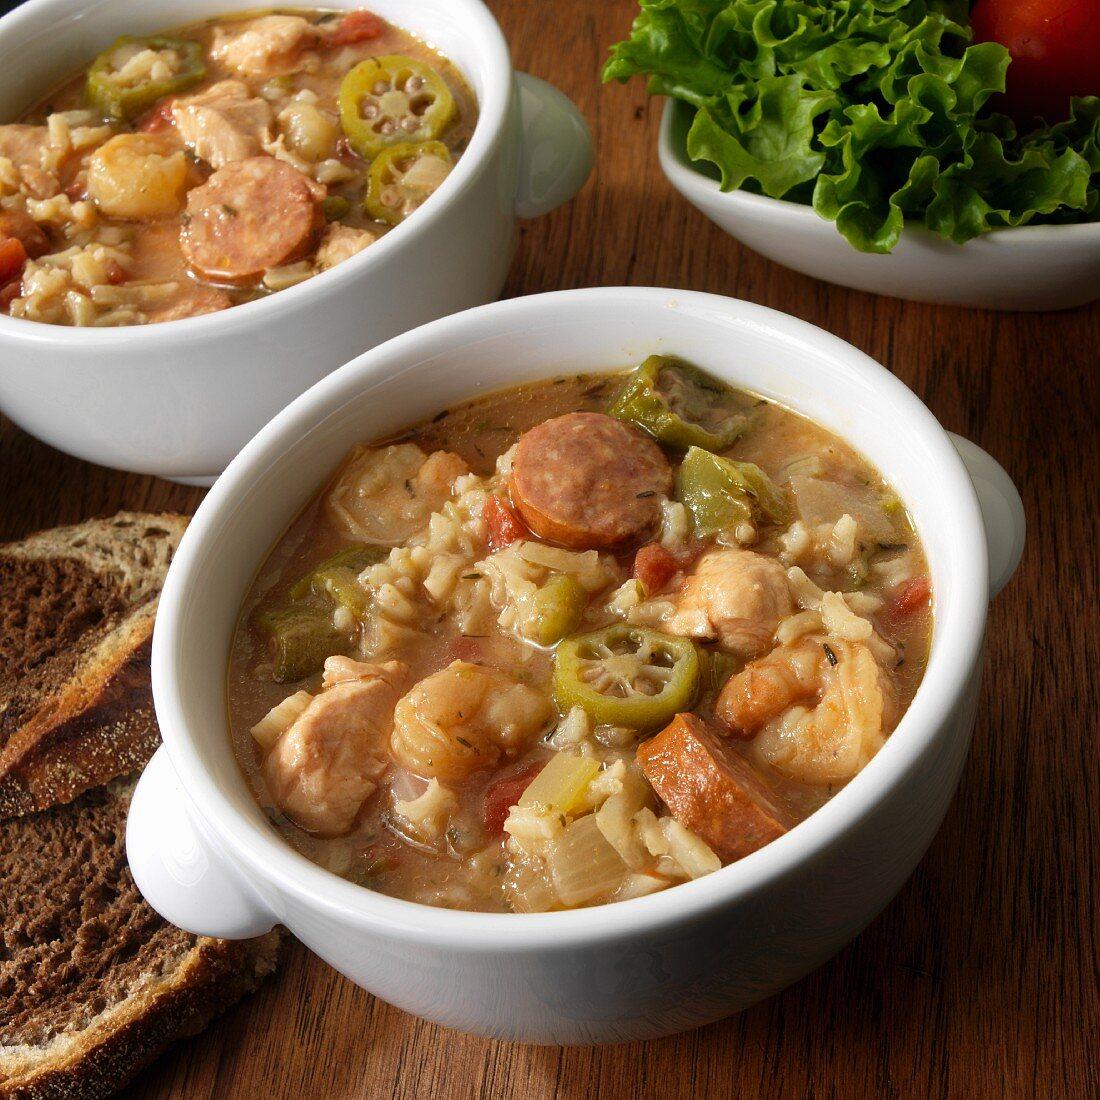 Gumbo with shrimp, andouille sausage, chicken, rice, okra, onion, USA